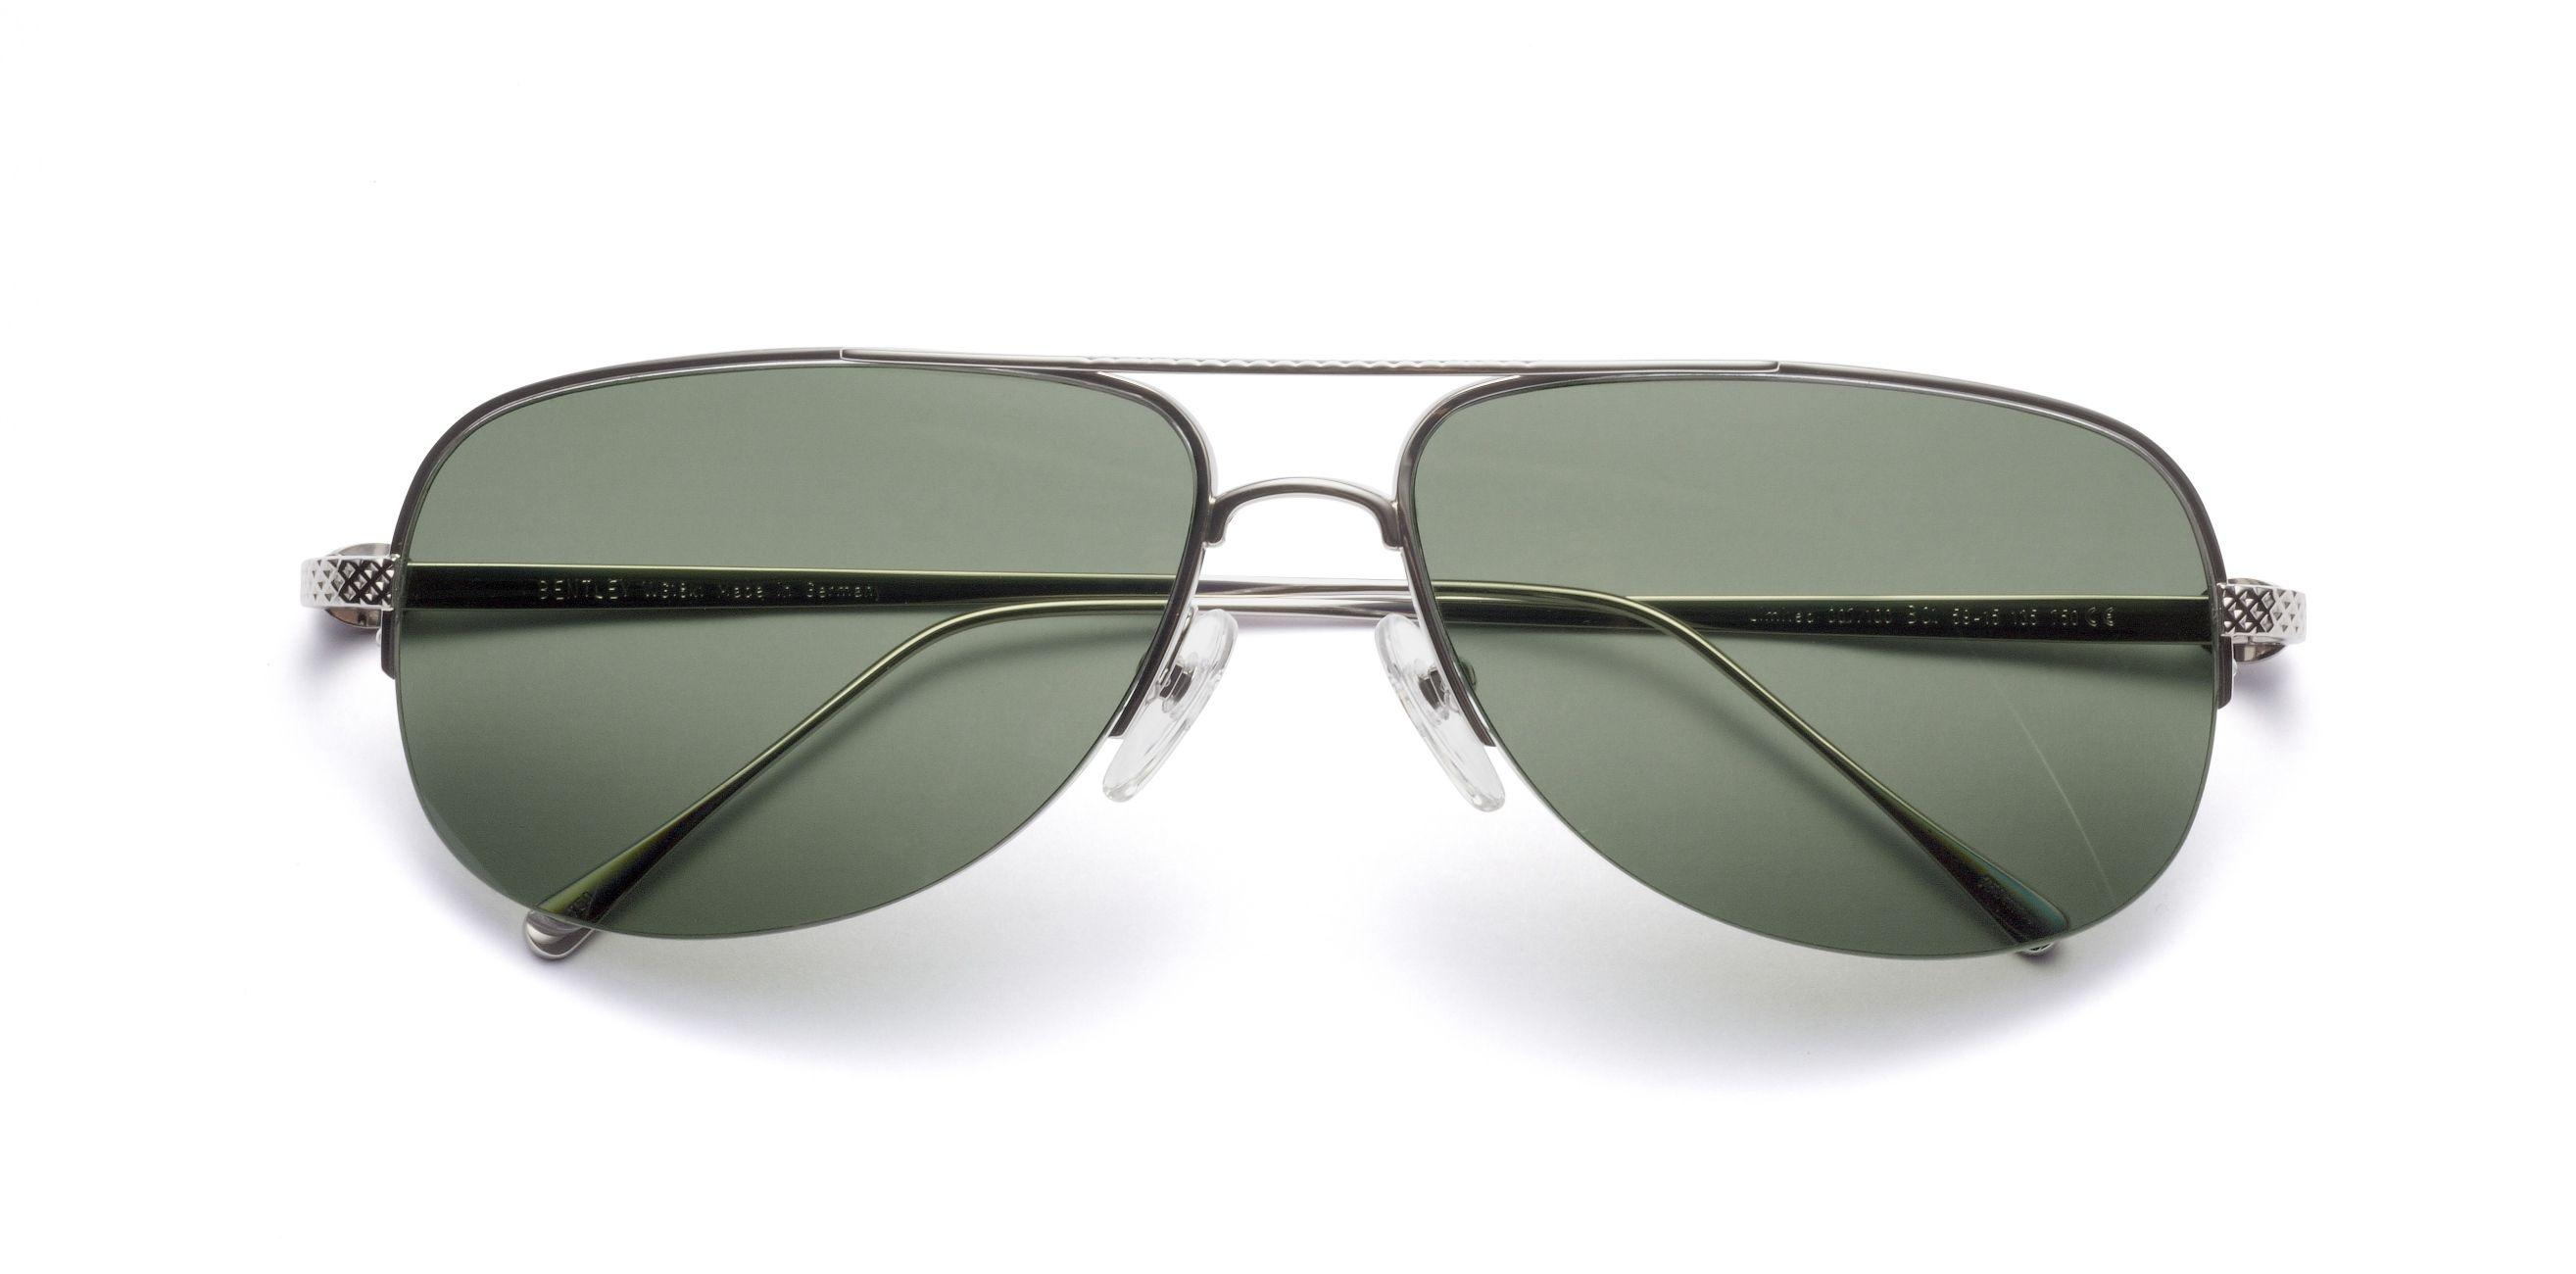 775fd9ea1374 Bentley Sunglasses for Men These look cool